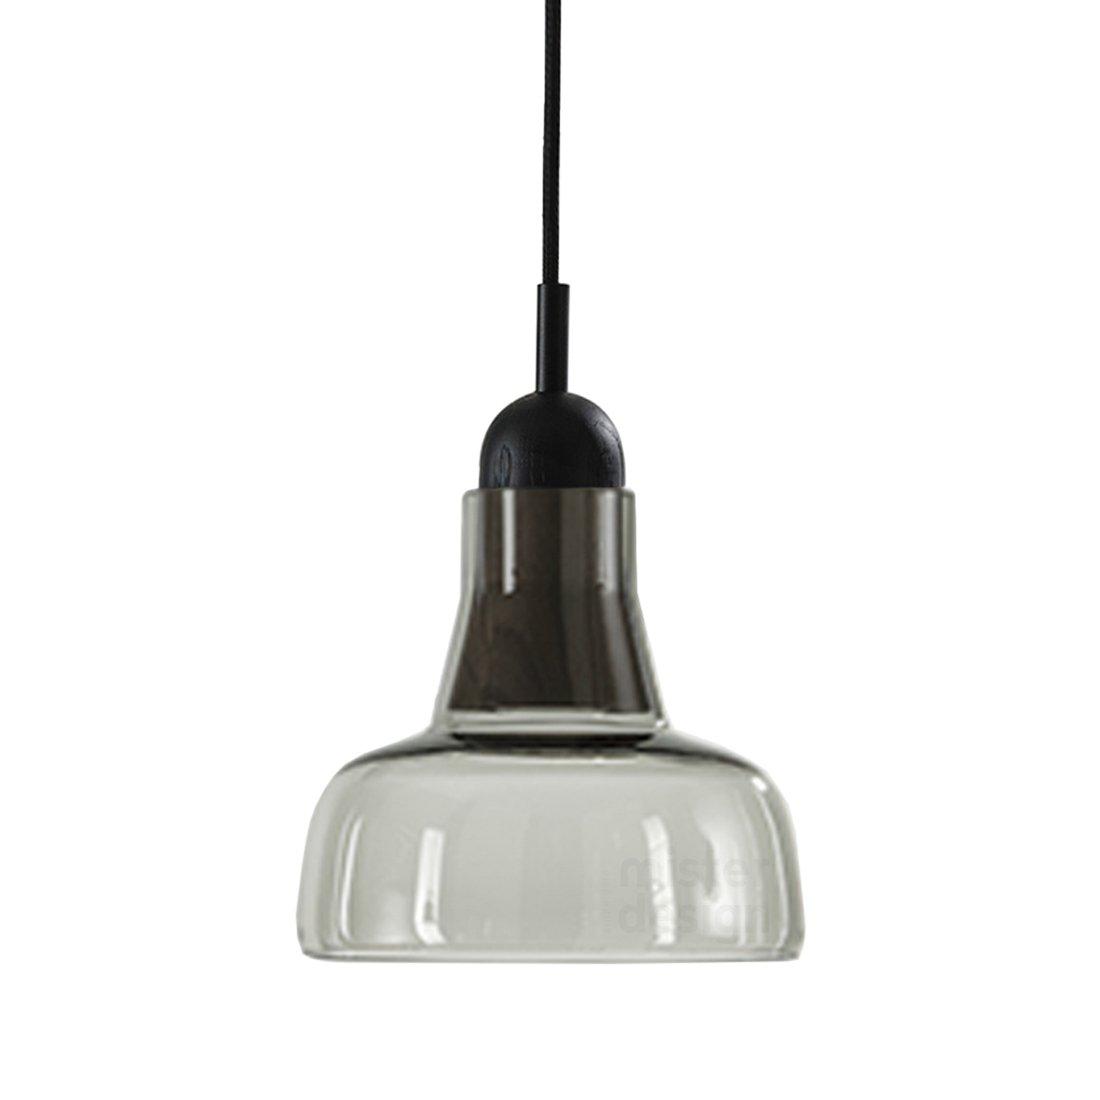 Brokis Shadow Waist Hanglamp - Zwart Eiken Glossy Transparant